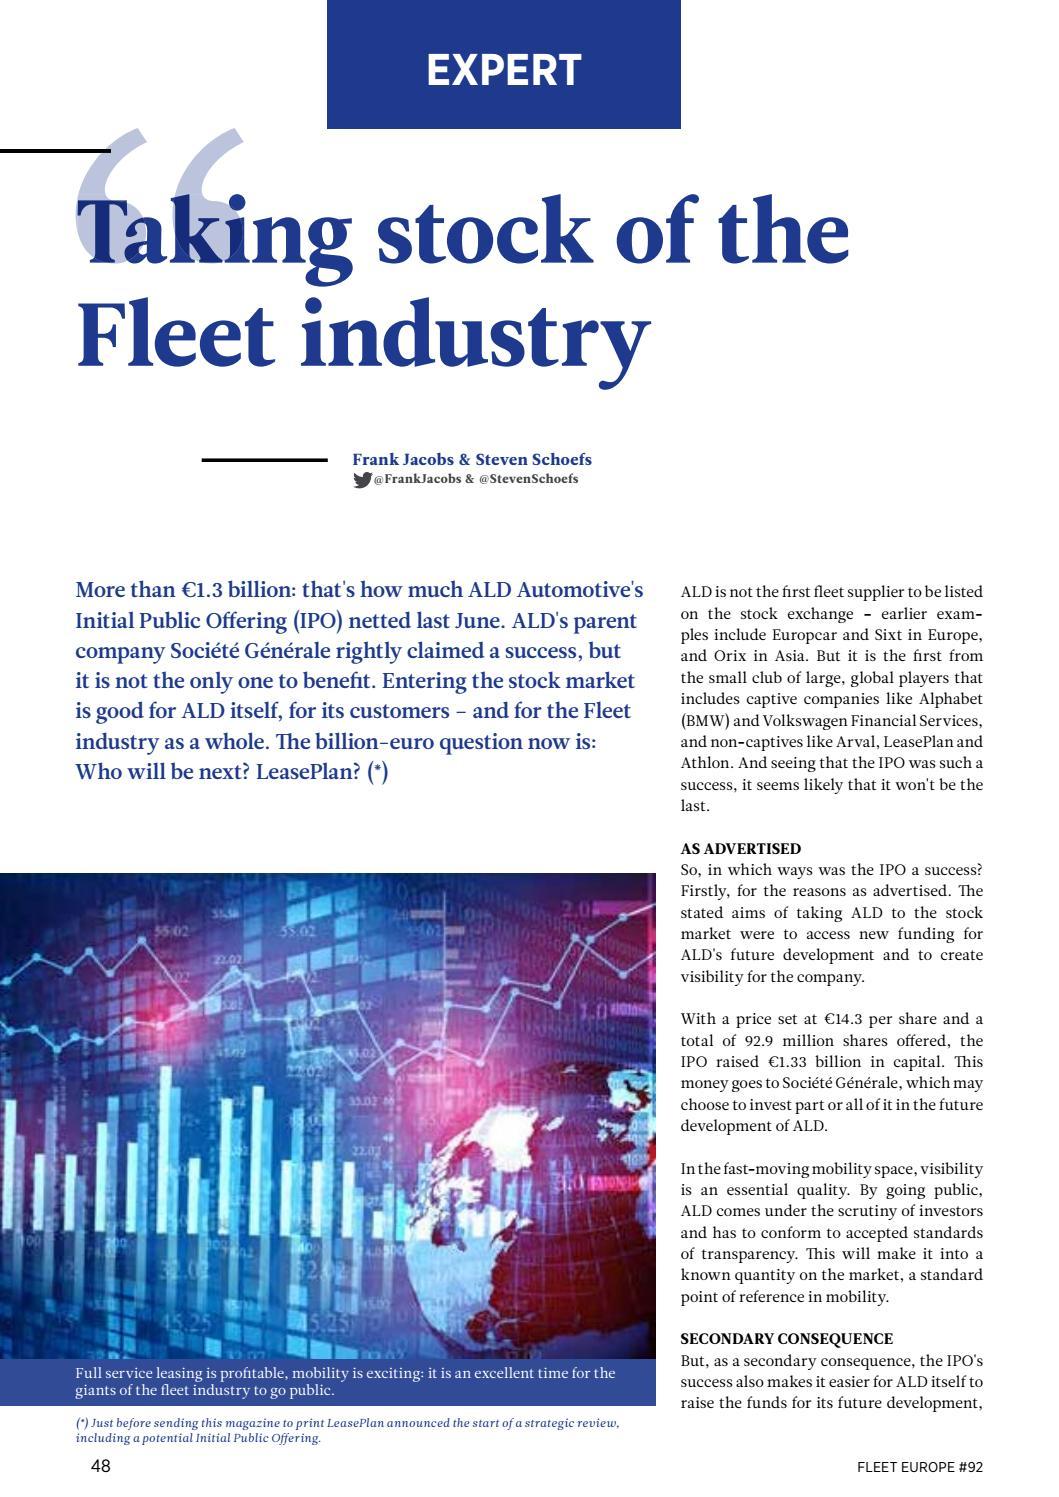 Fleet Europe °92 by Nexus Communication - issuu